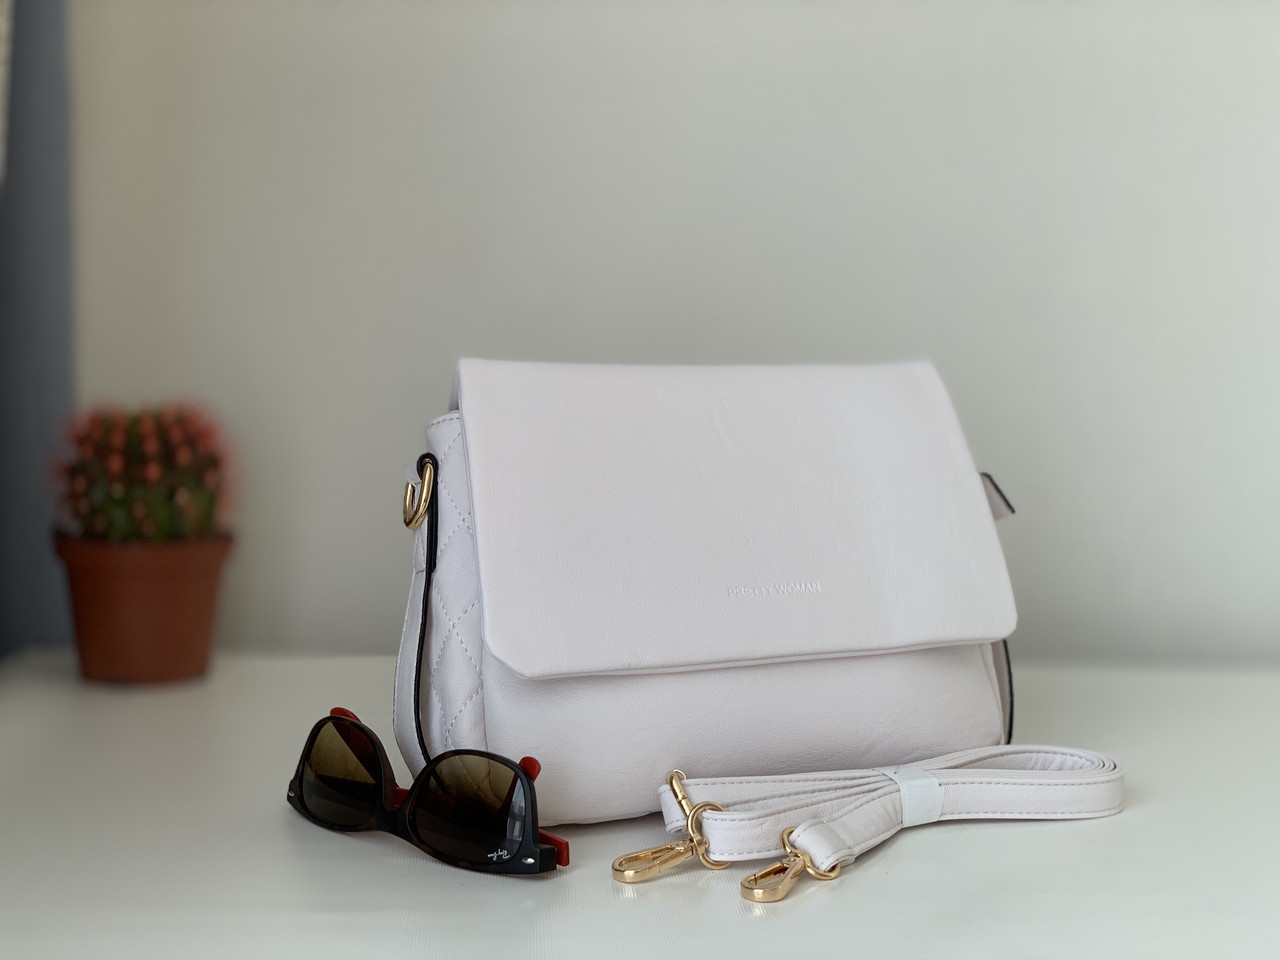 Белая женская сумка молодежная повседневная на плечо Pretty Woman